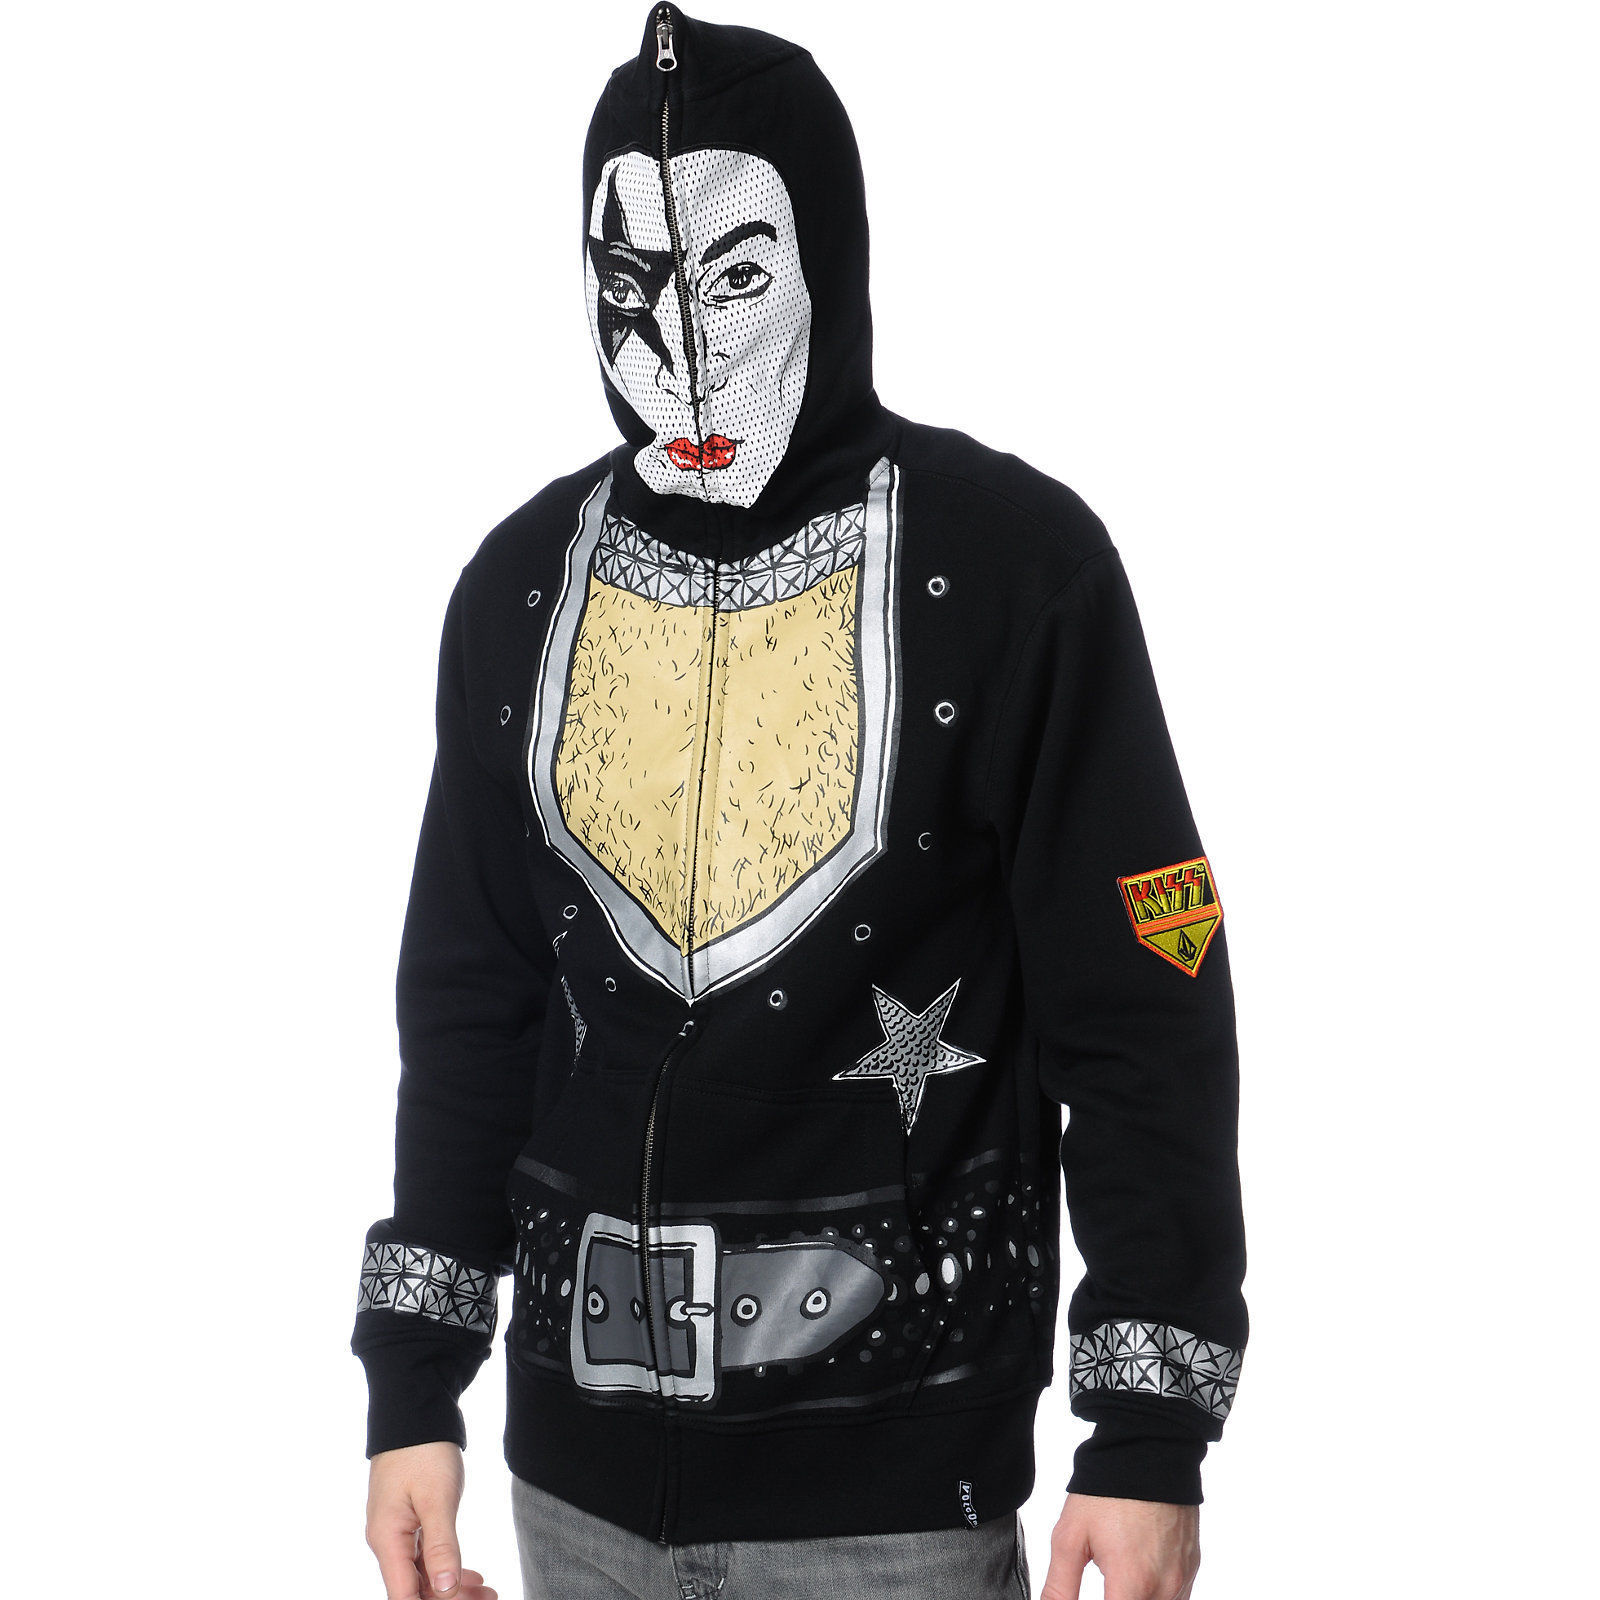 Volcom Kiss Full Face Black Full Zip Hooded Sweat Jacket Hoodie Mens NWT